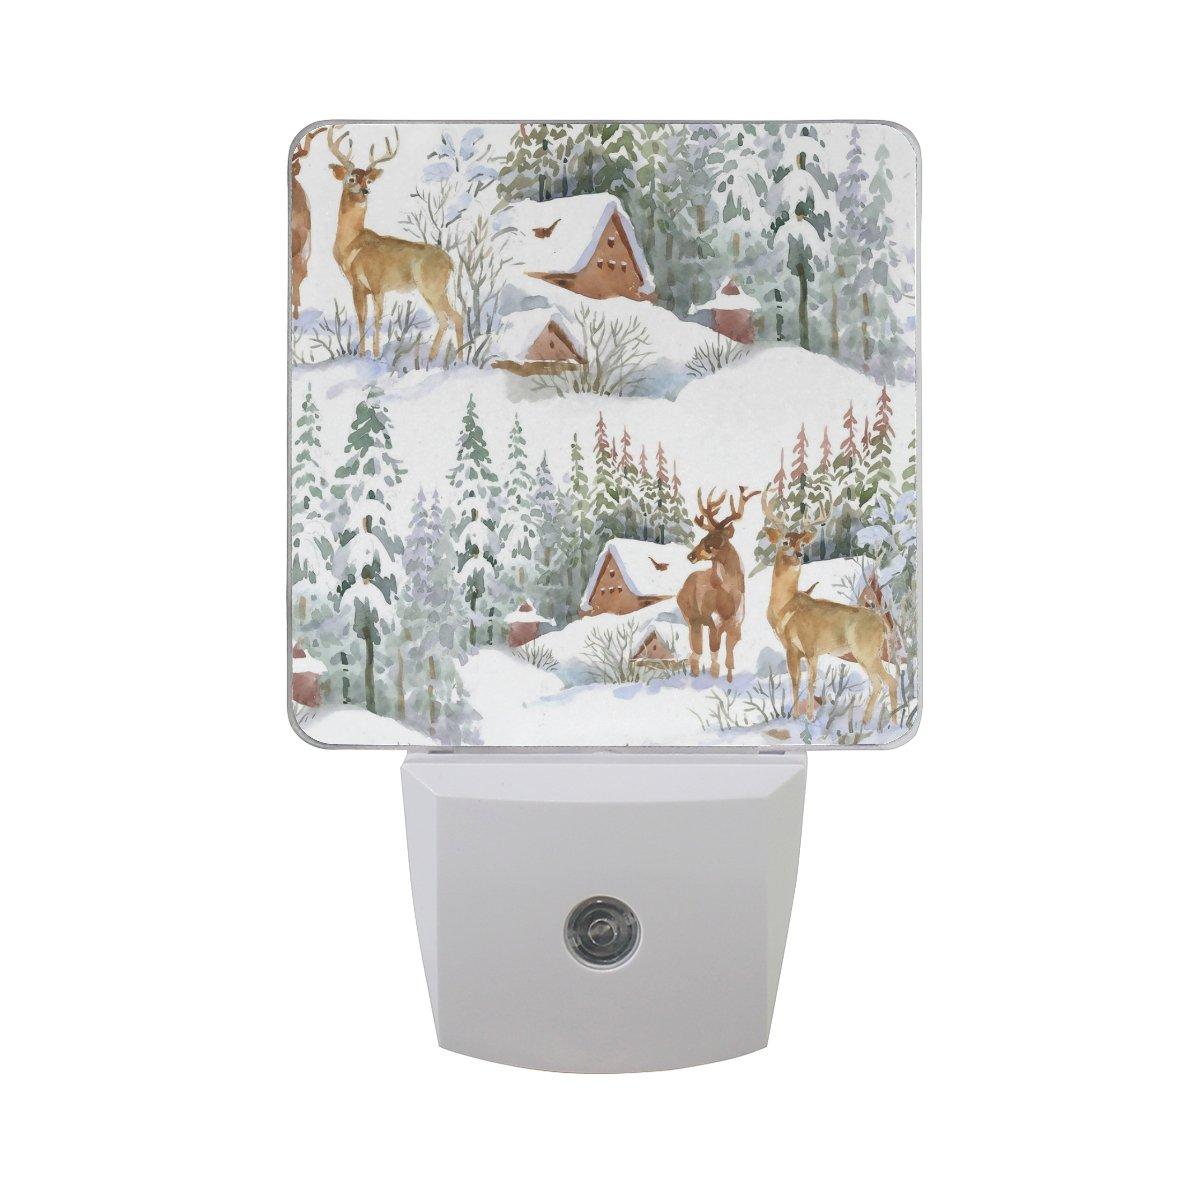 ALAZA Winter Tree Animal Deer Forest Snow LED Night Light Dusk to Dawn Sensor Plug in Night Home Decor Desk Lamp for Adult